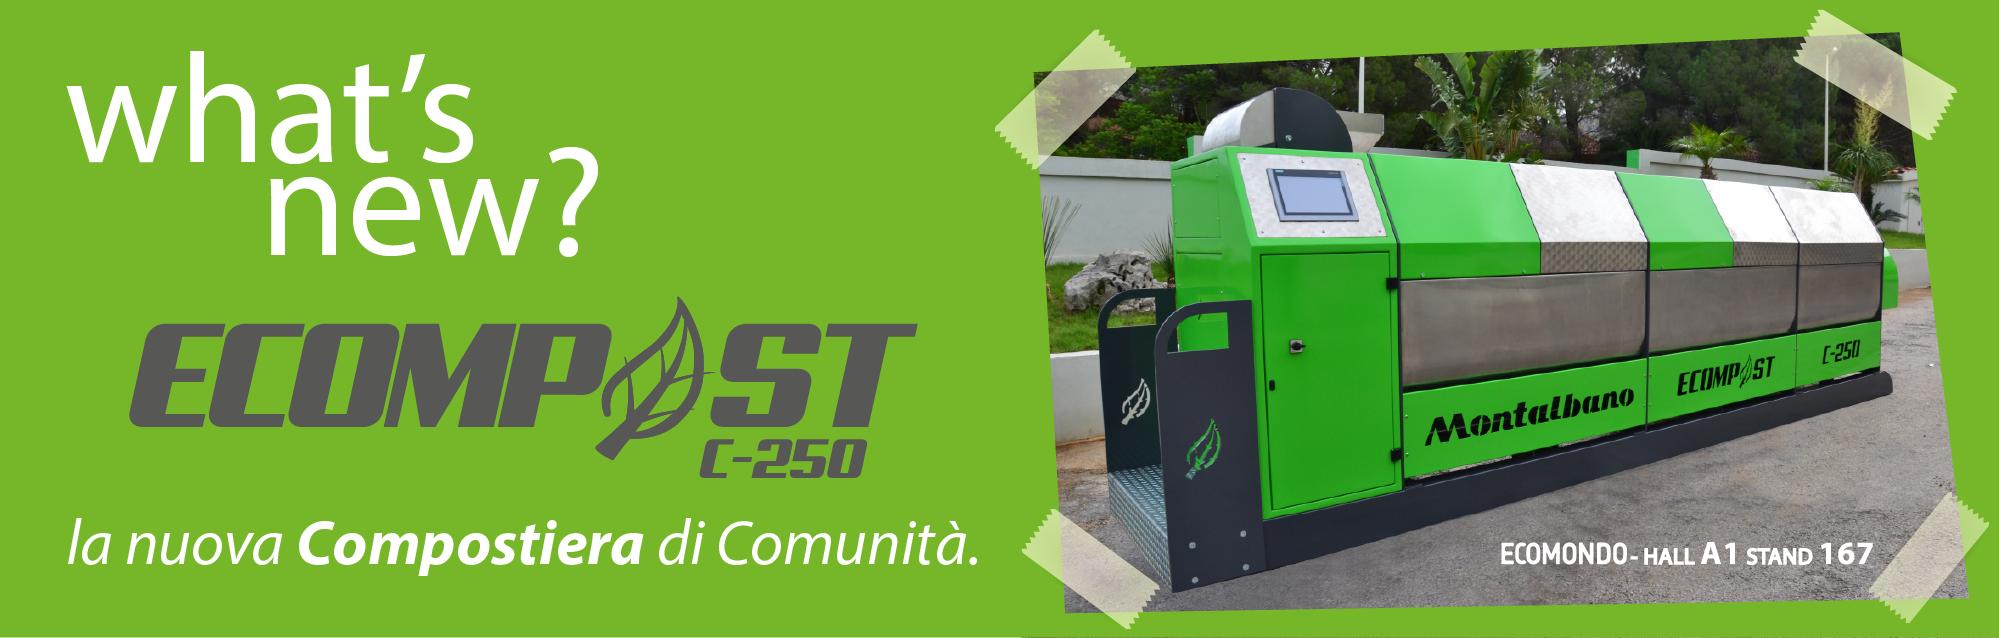 banner-ecompost